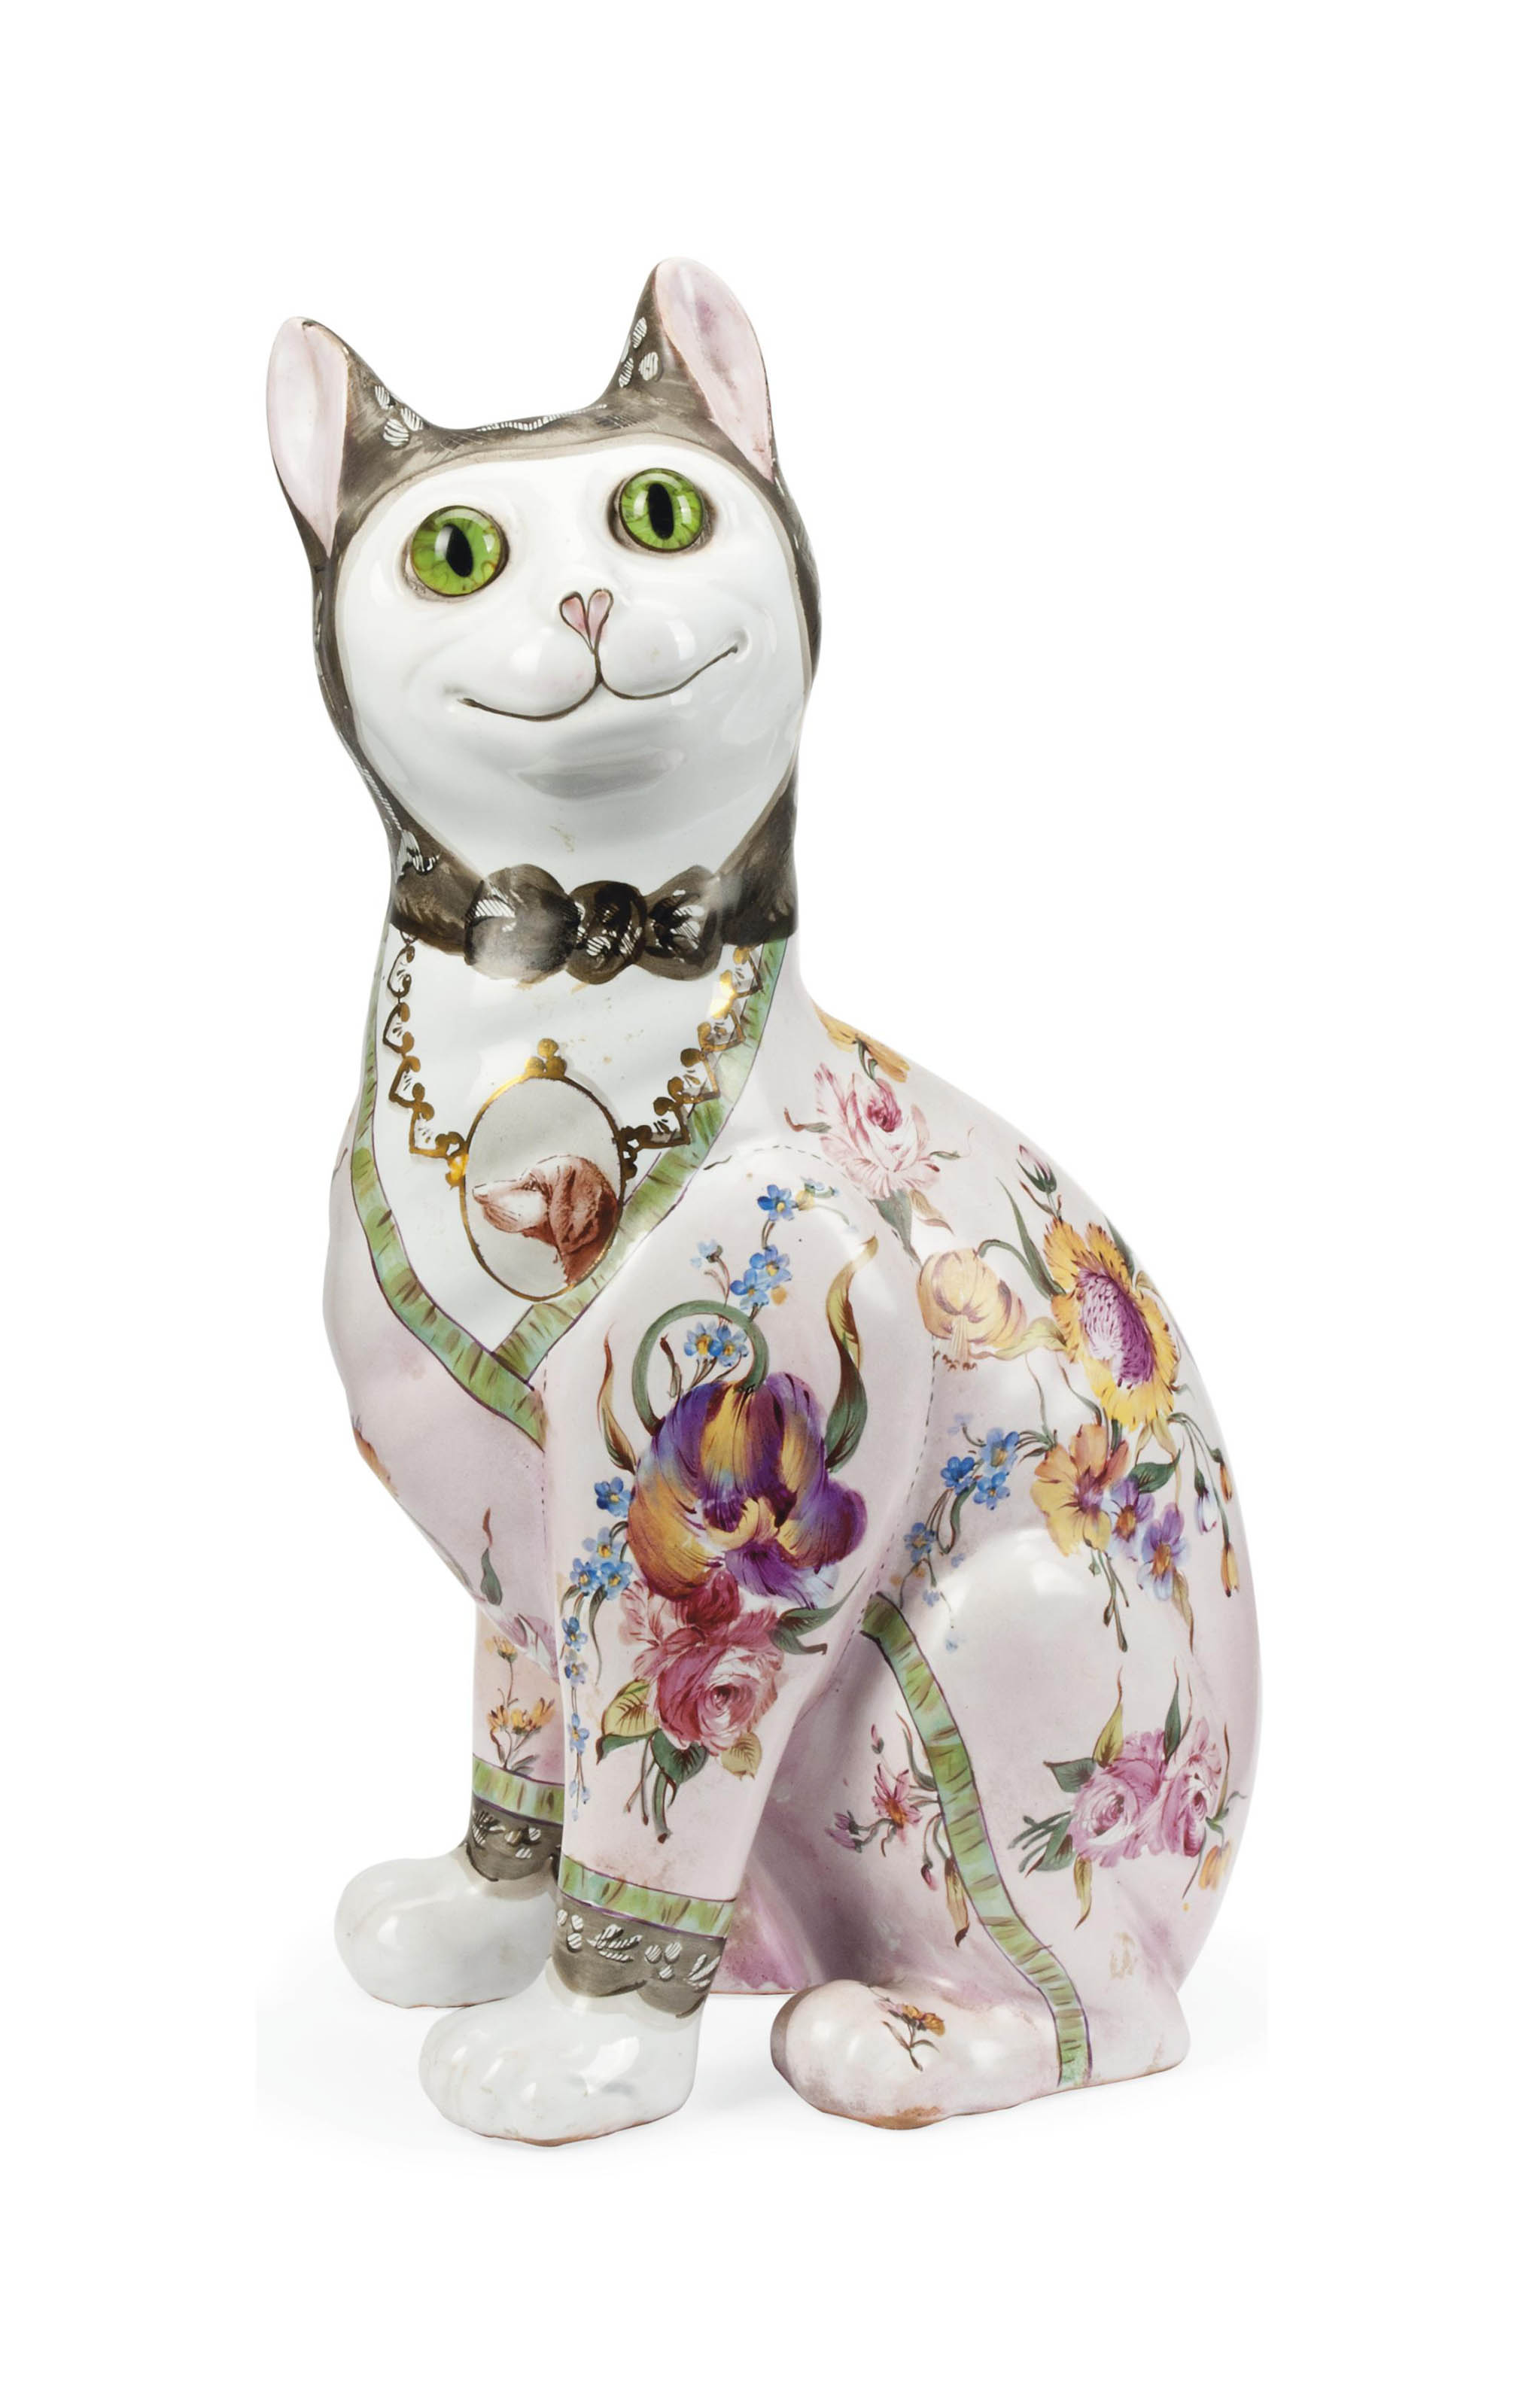 AN EMILE GALLÉ FAEINCE MODEL OF A CAT